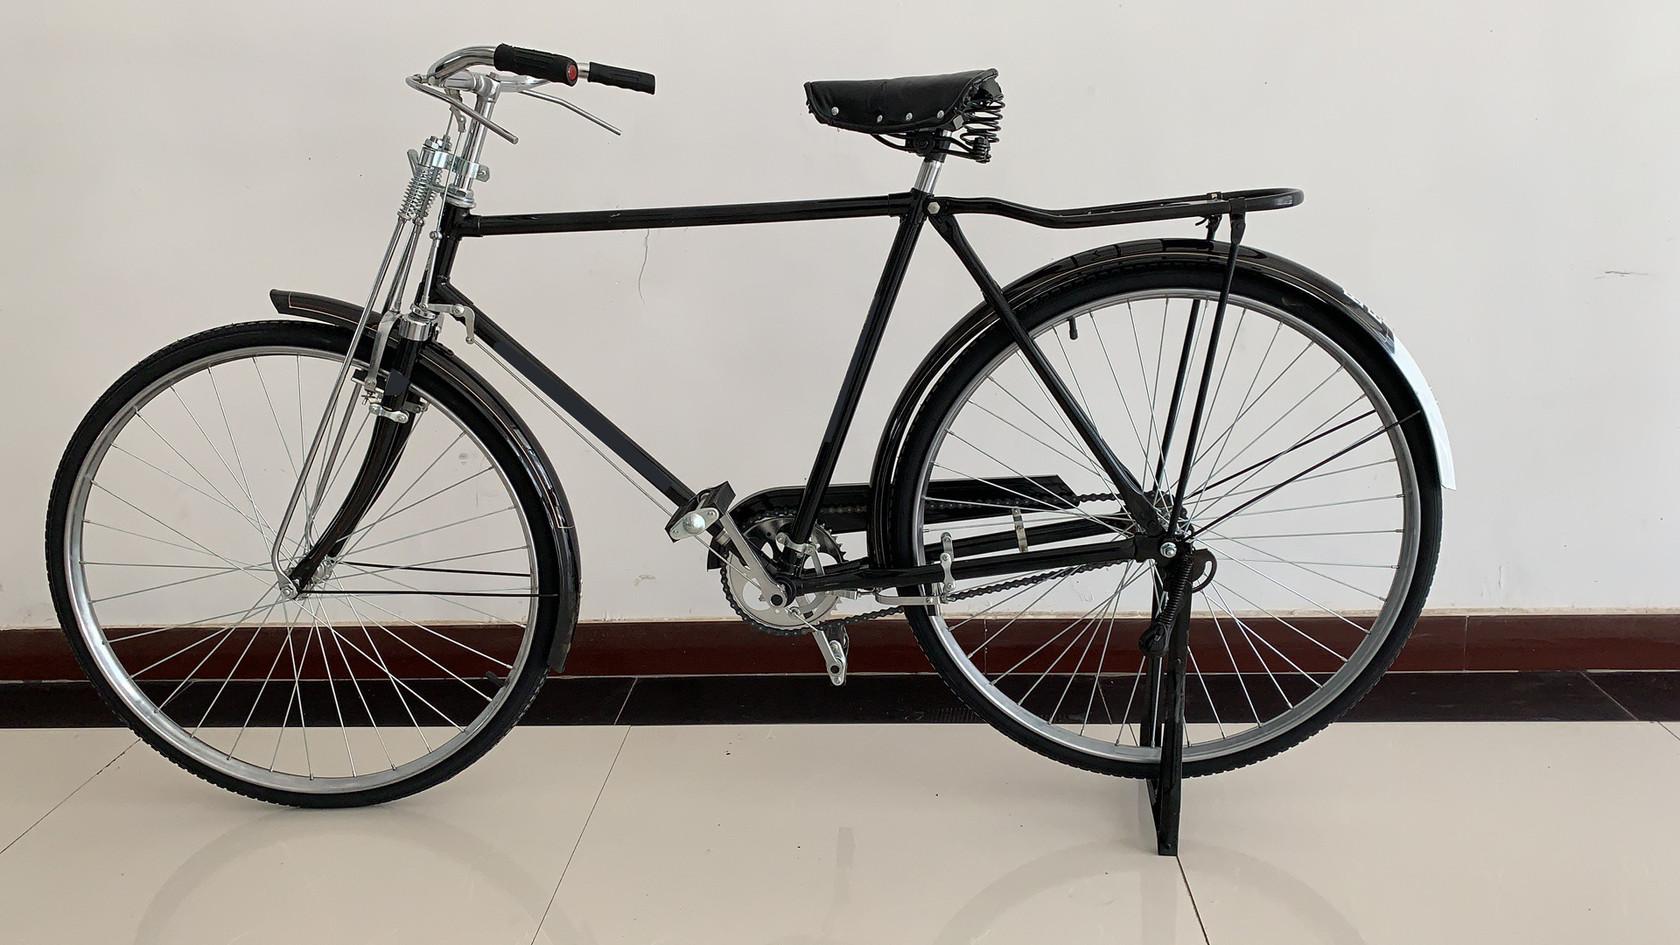 Isapa classic bike_Cycle Chris_190417 (6